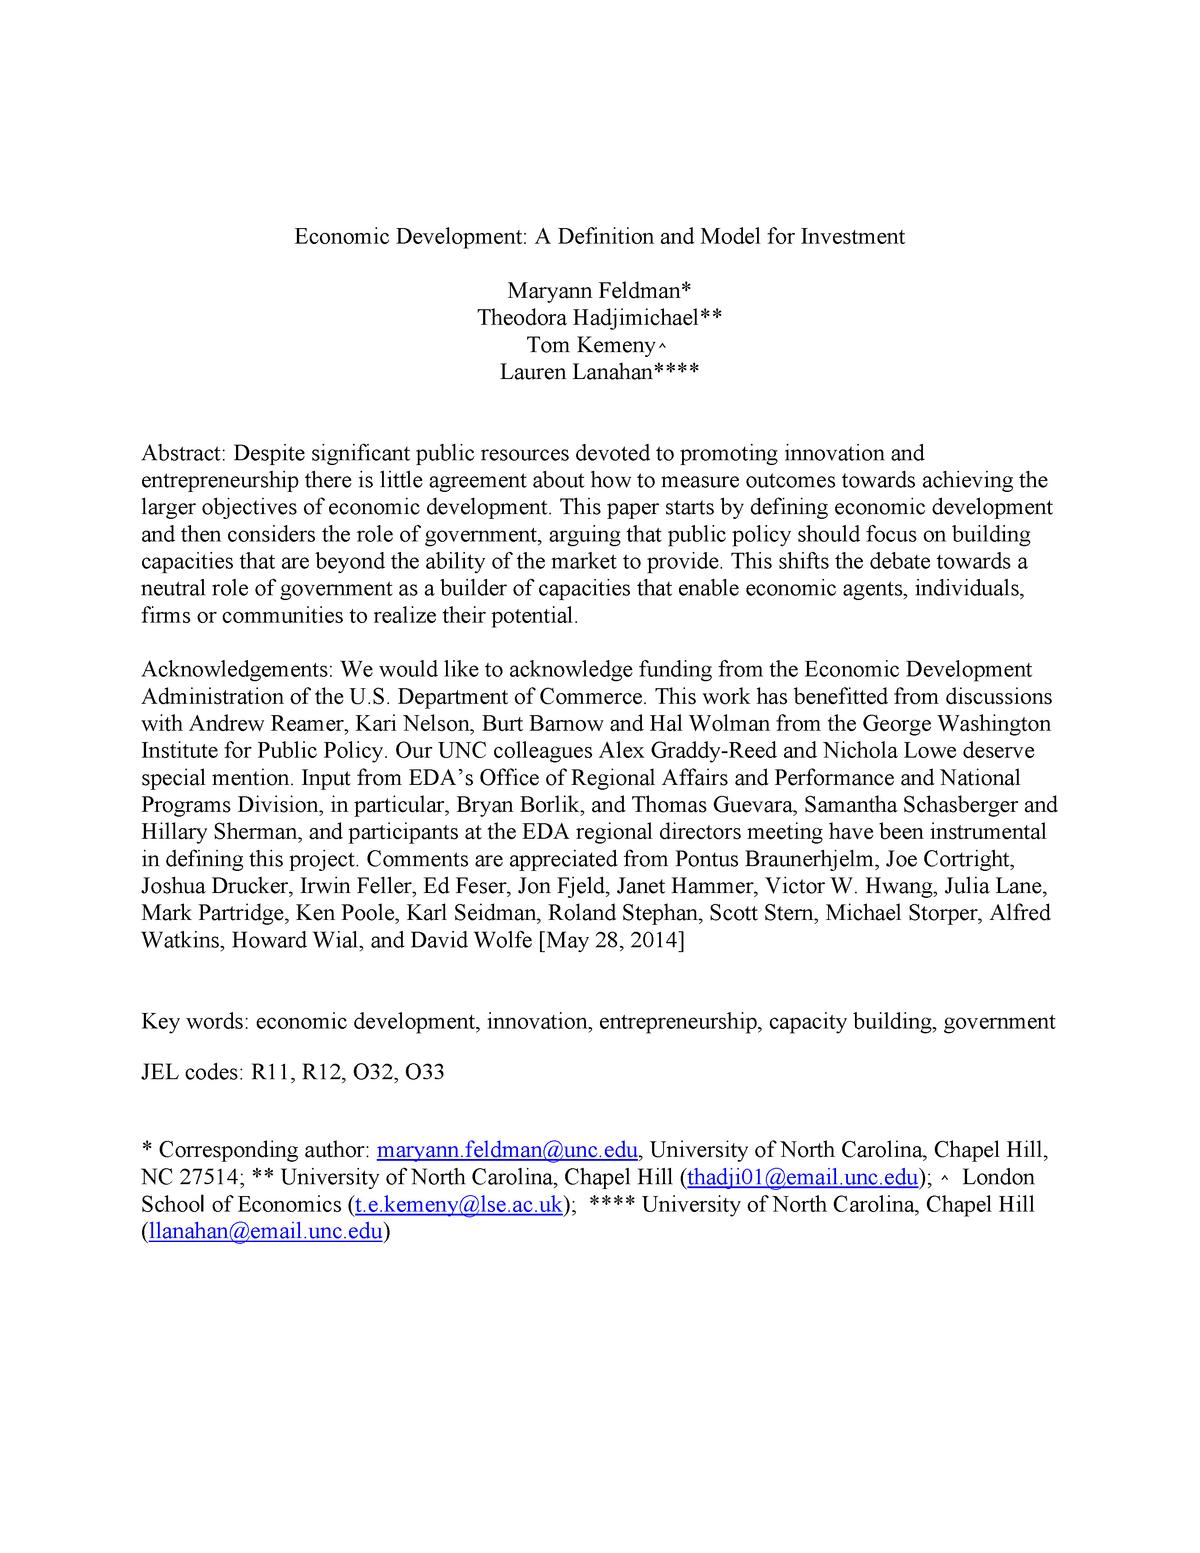 Investment-definition-model - ECON313: Economic Development